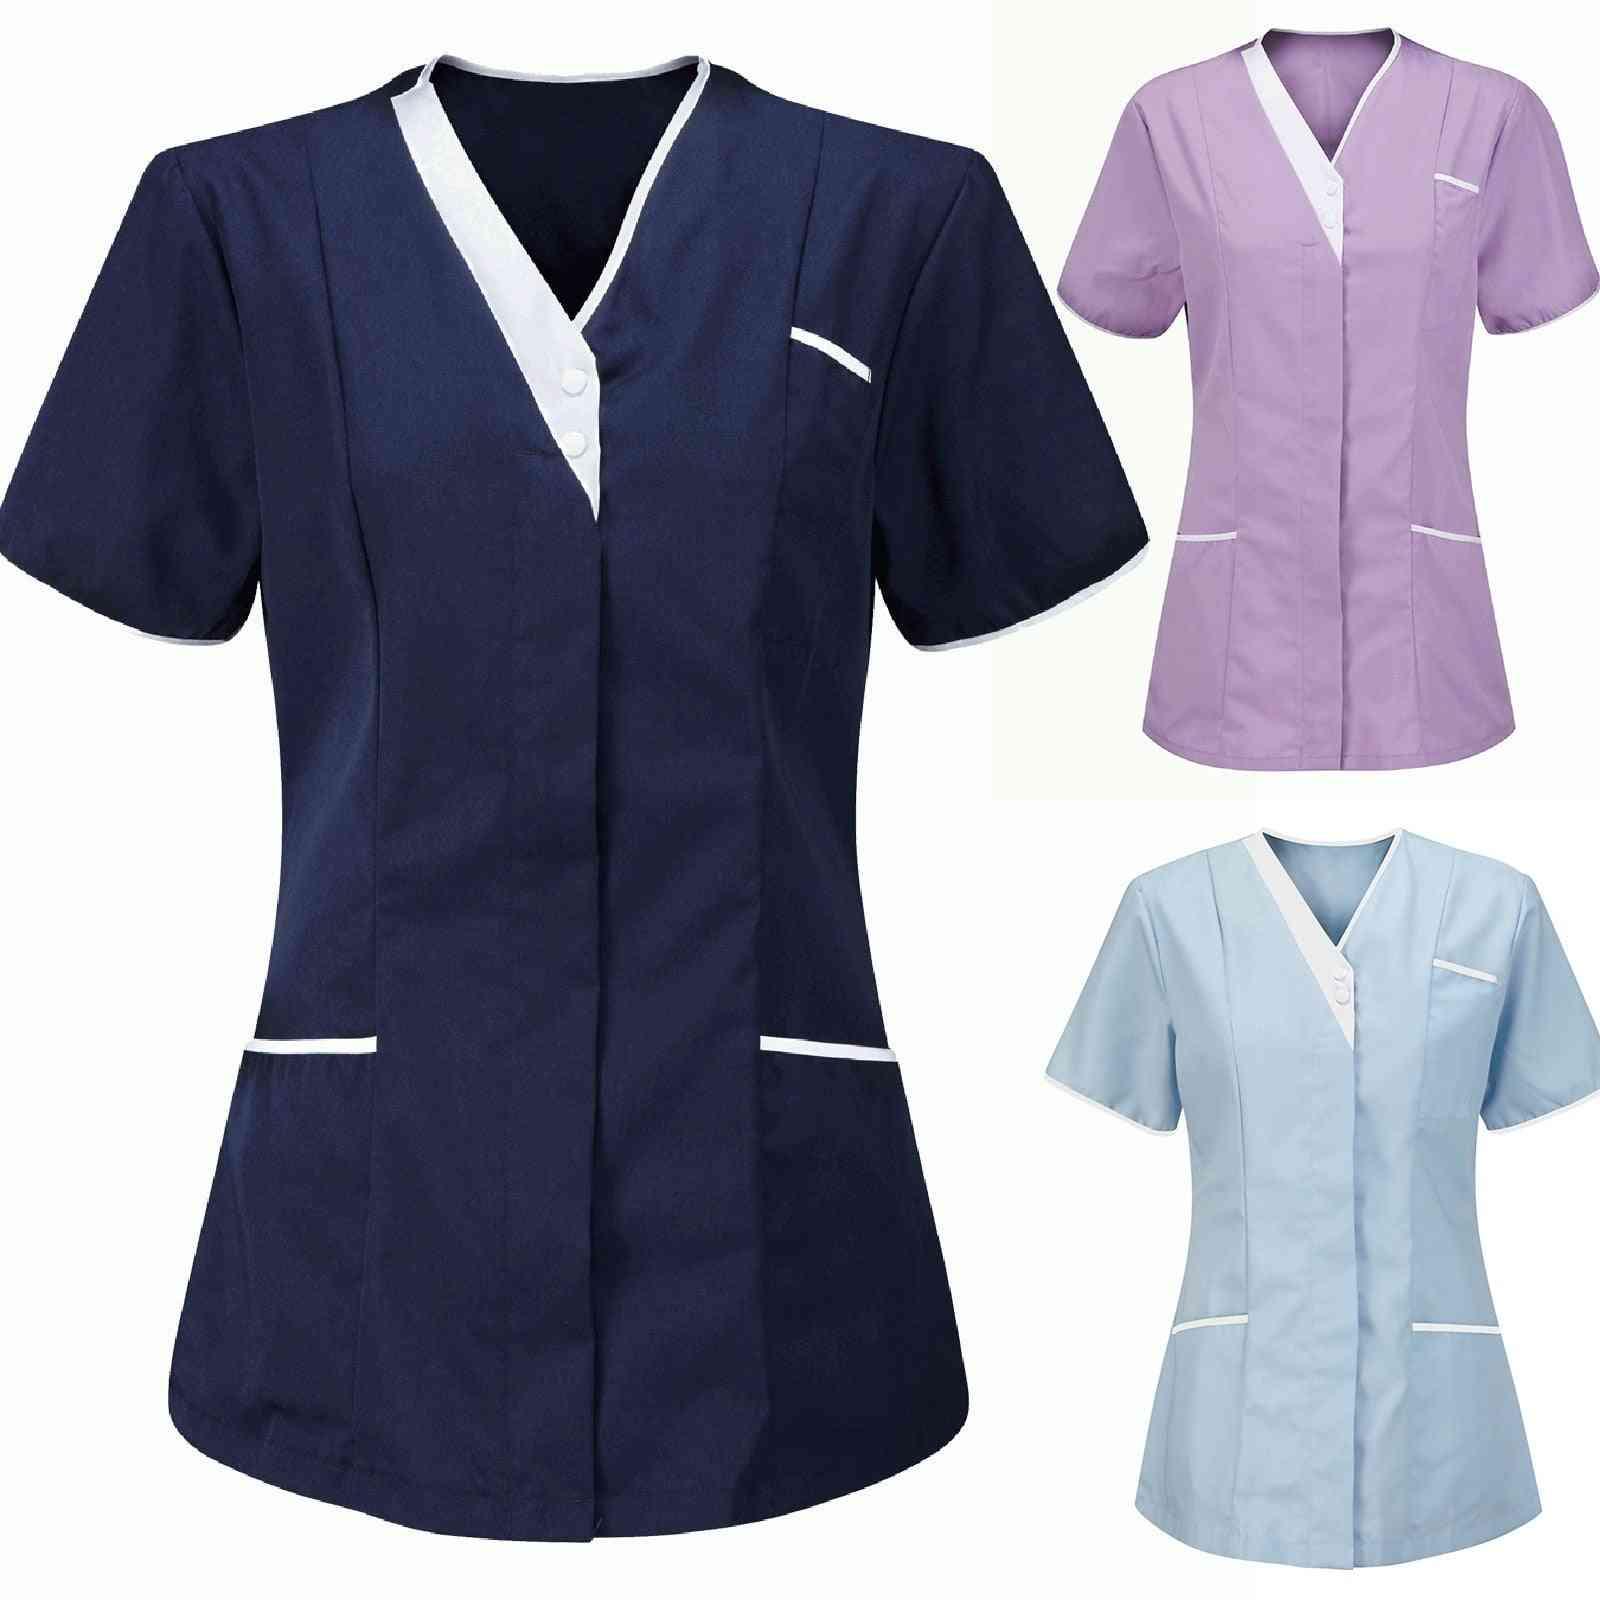 Summer Work Wear Tops, Short Sleeve Sexy V-neck Uniform